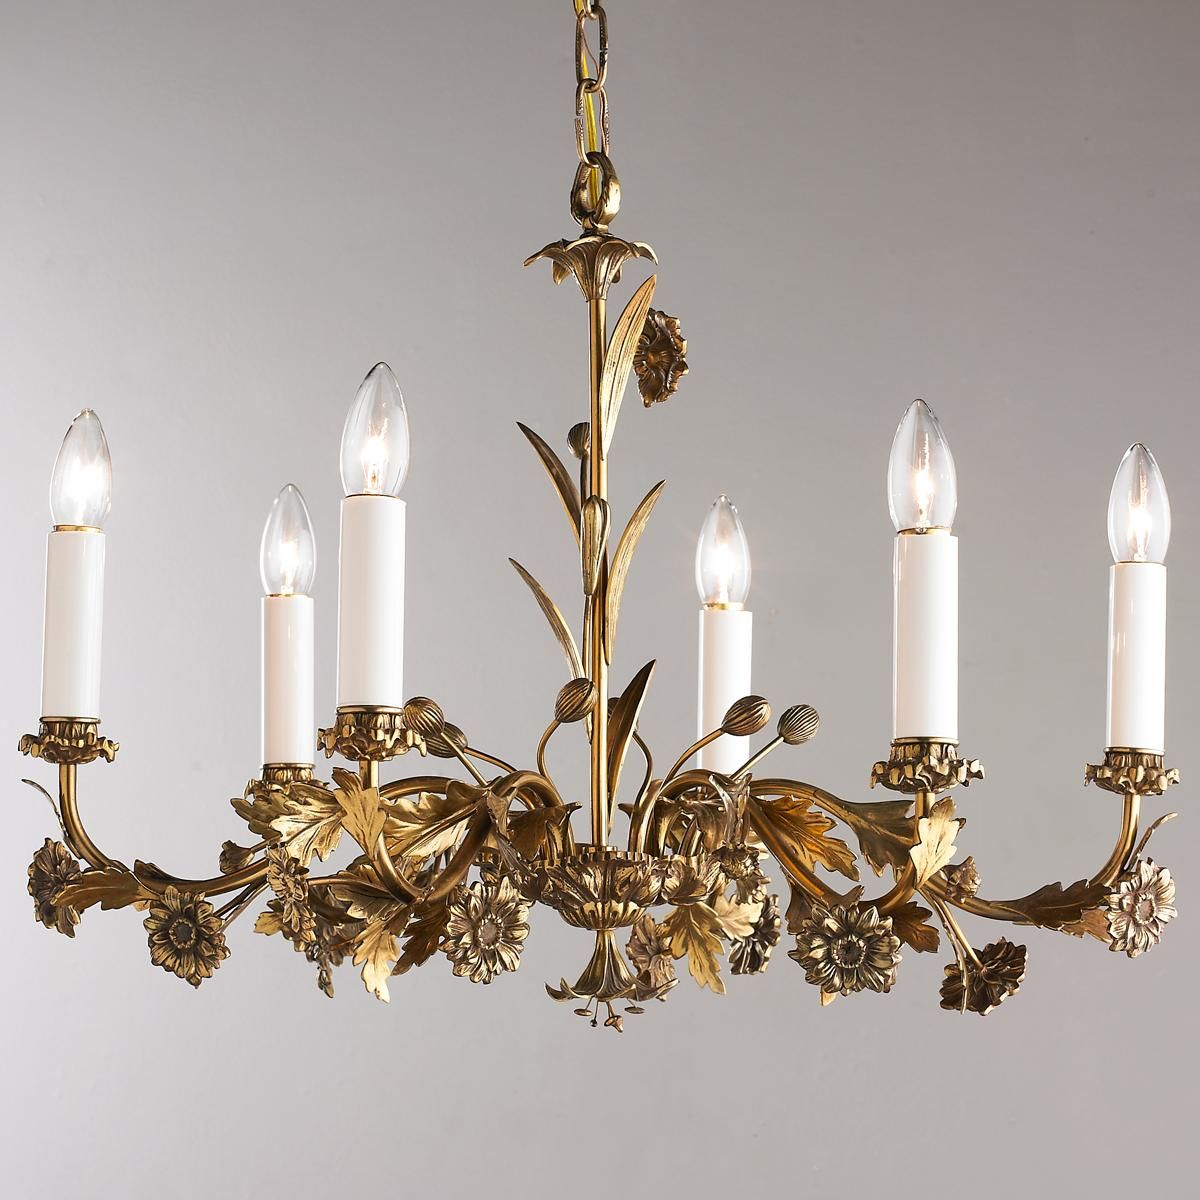 Simple Antique Brass Chandeliers Remarkable Chandelier Remodel Ideas with  Antique Brass Chandeliers - Antique 6 Arm Floral Brass Chandelier Lighting Pinterest